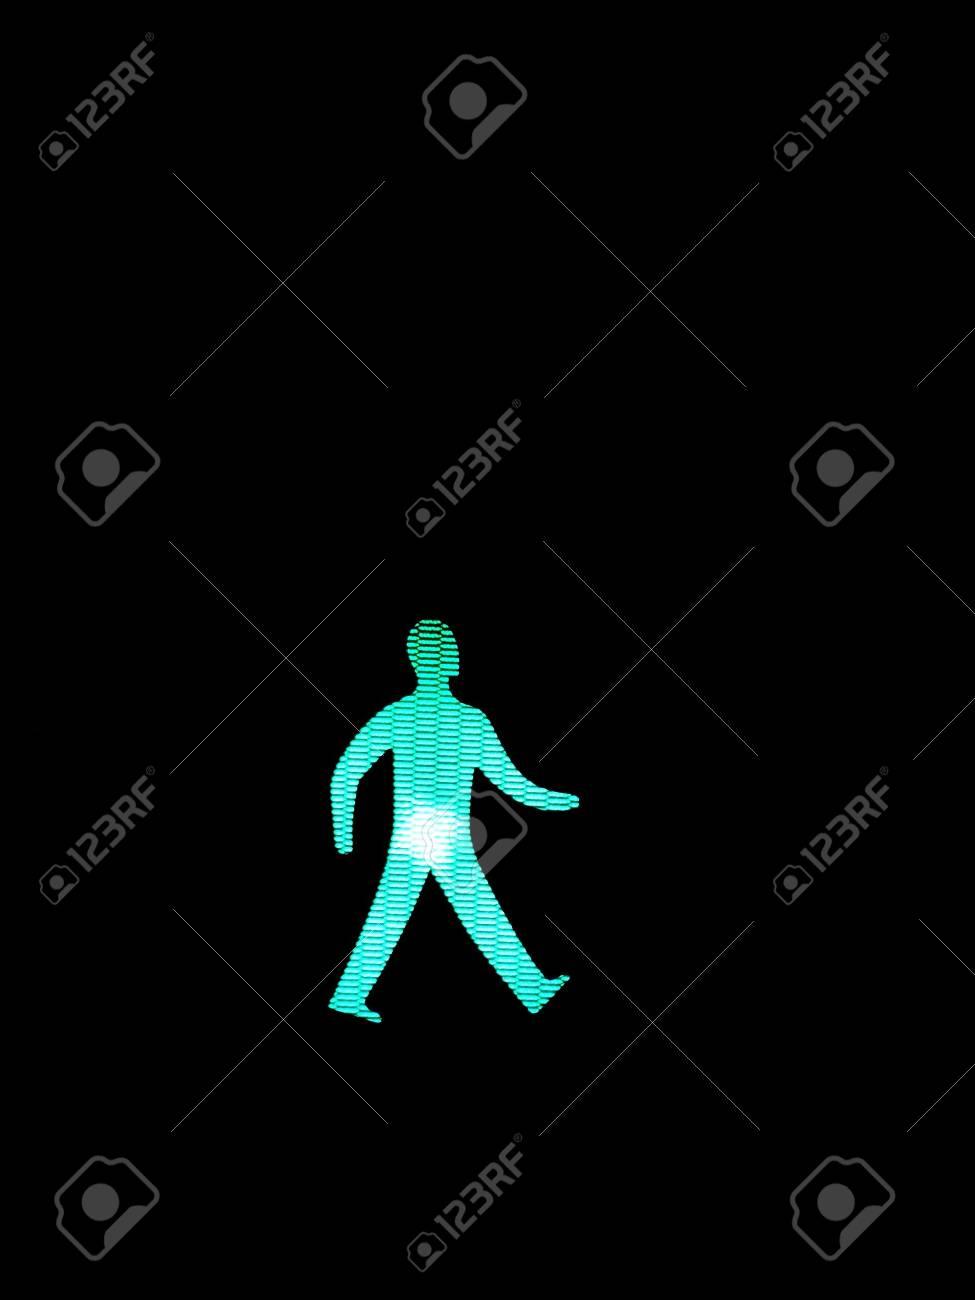 green pedestrian sign on traffic light in scotland Stock Photo - 2131363